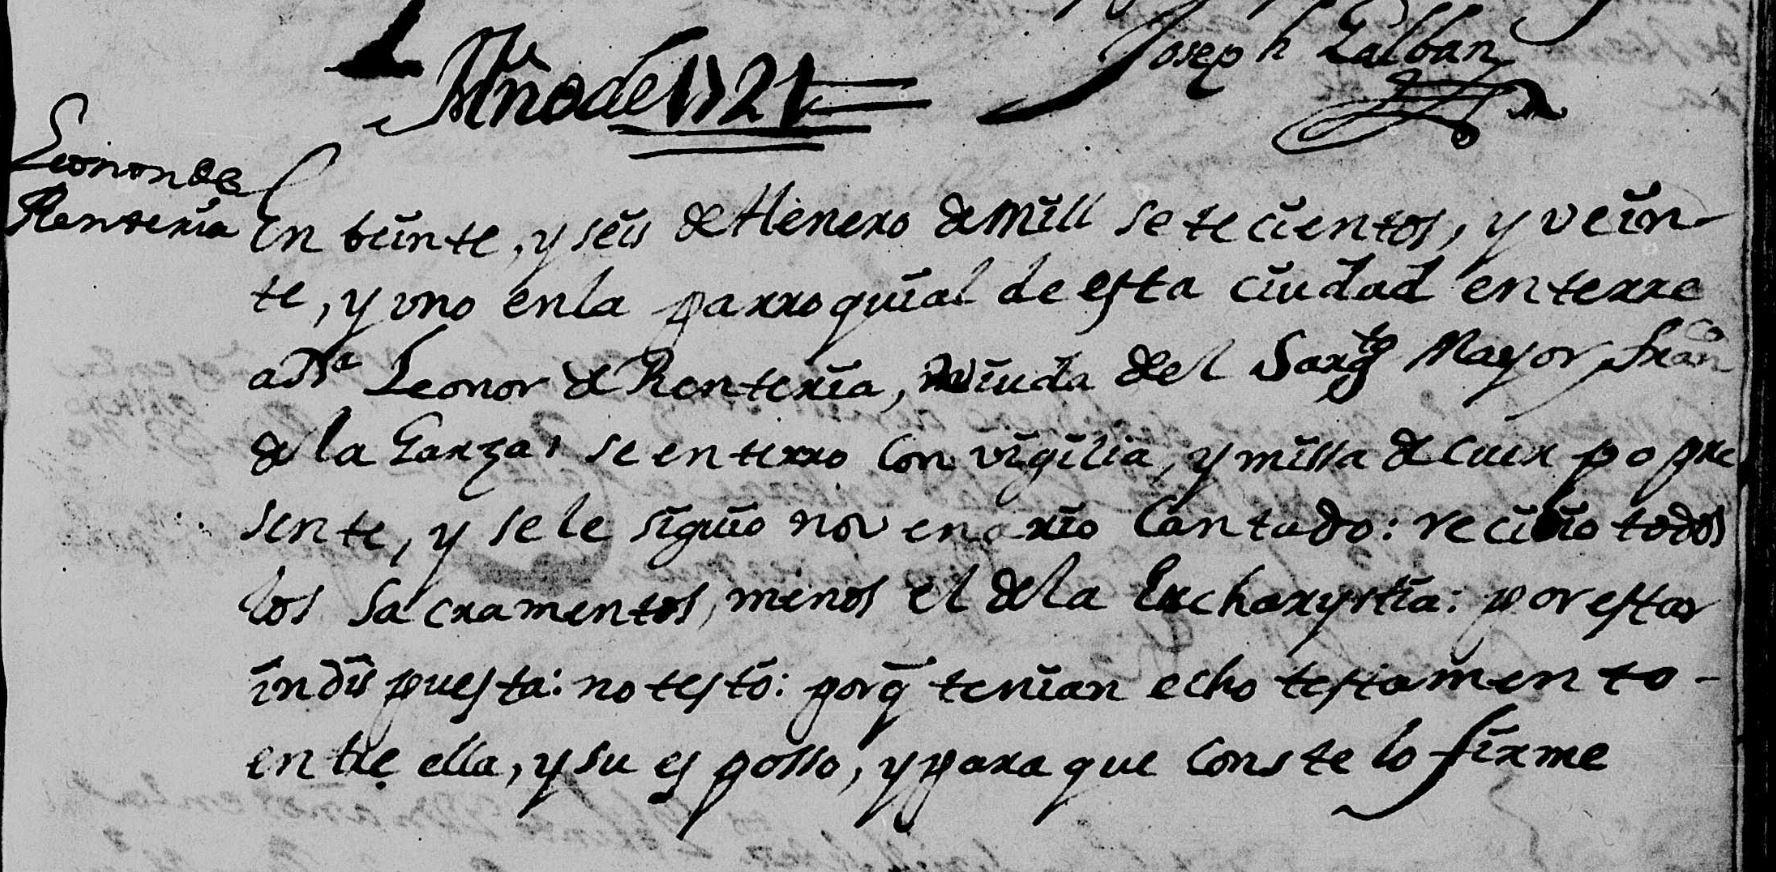 Death Record of Leonor de Renteria monterrey Nuevo Leon Mexico Pg 128